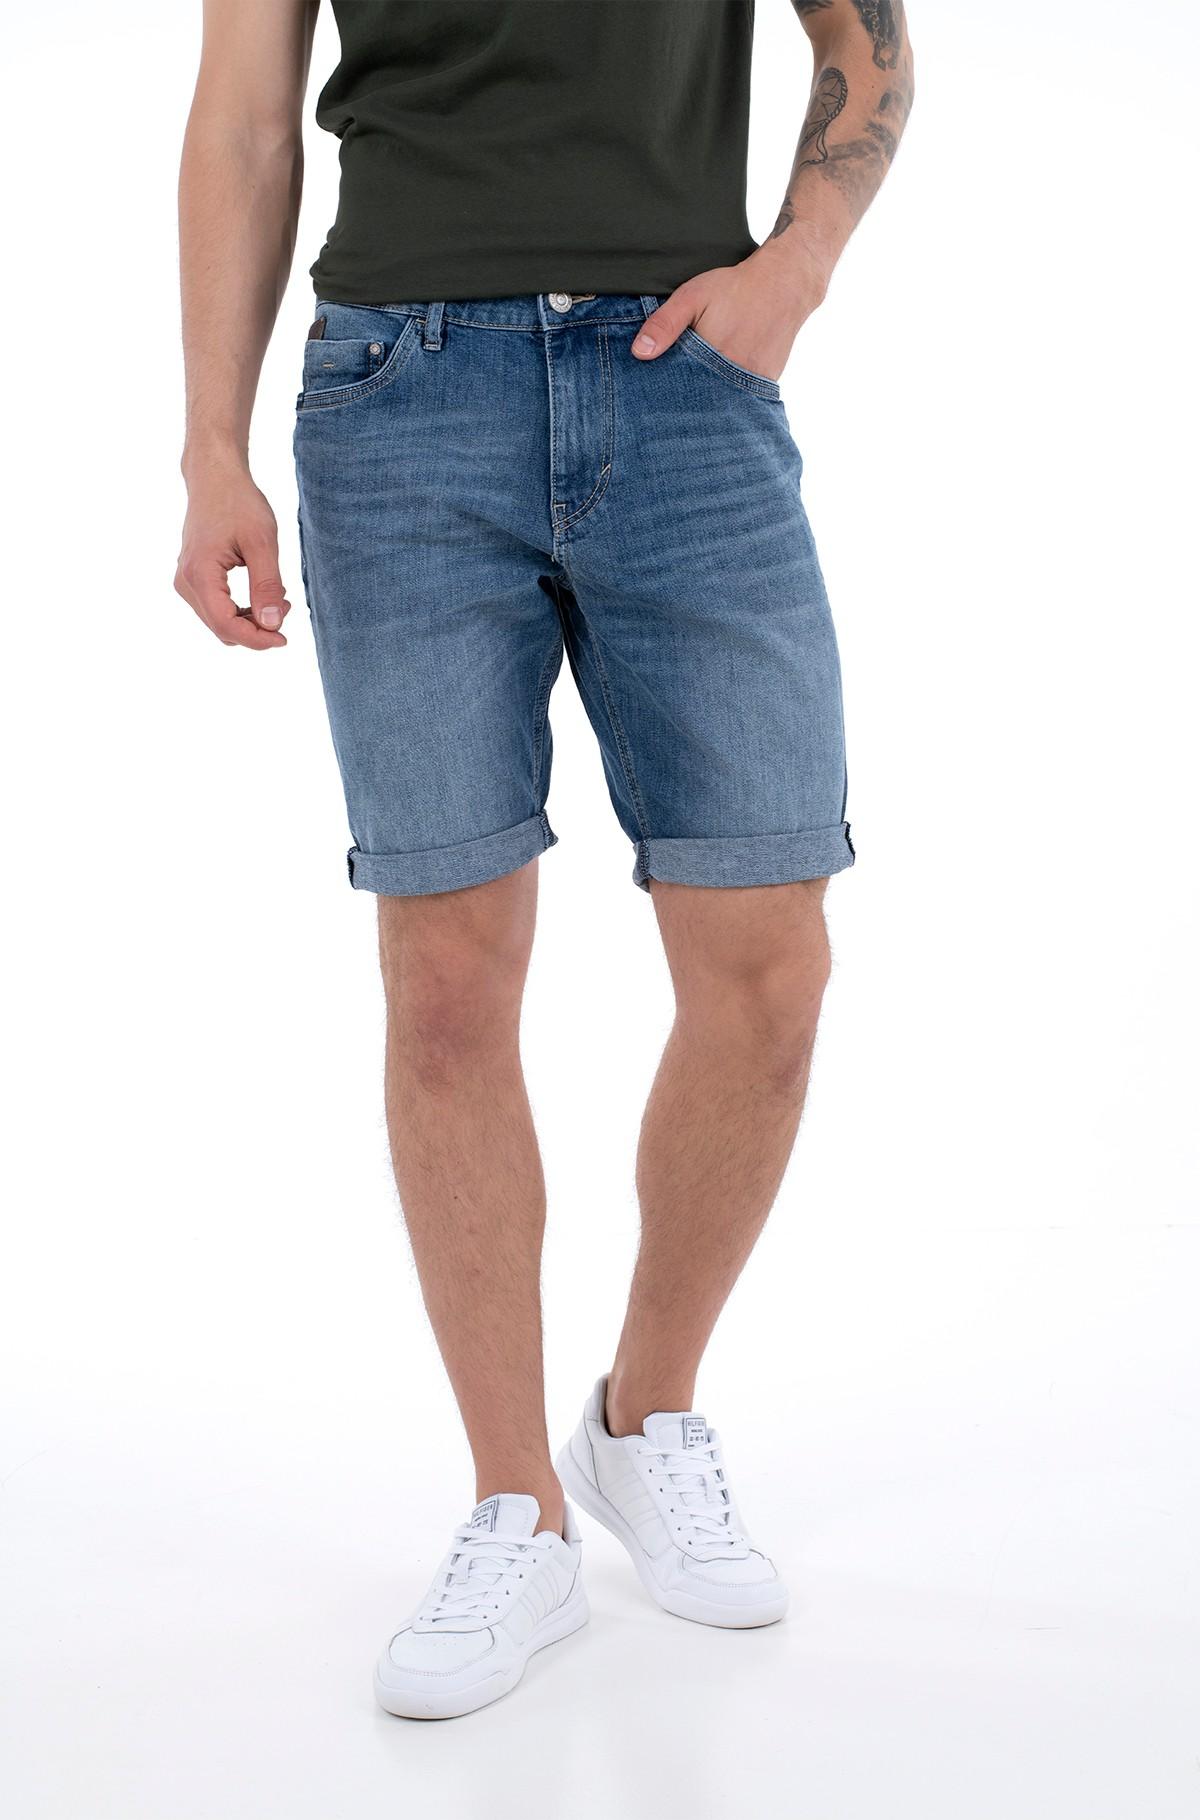 Shorts 1025047-full-1